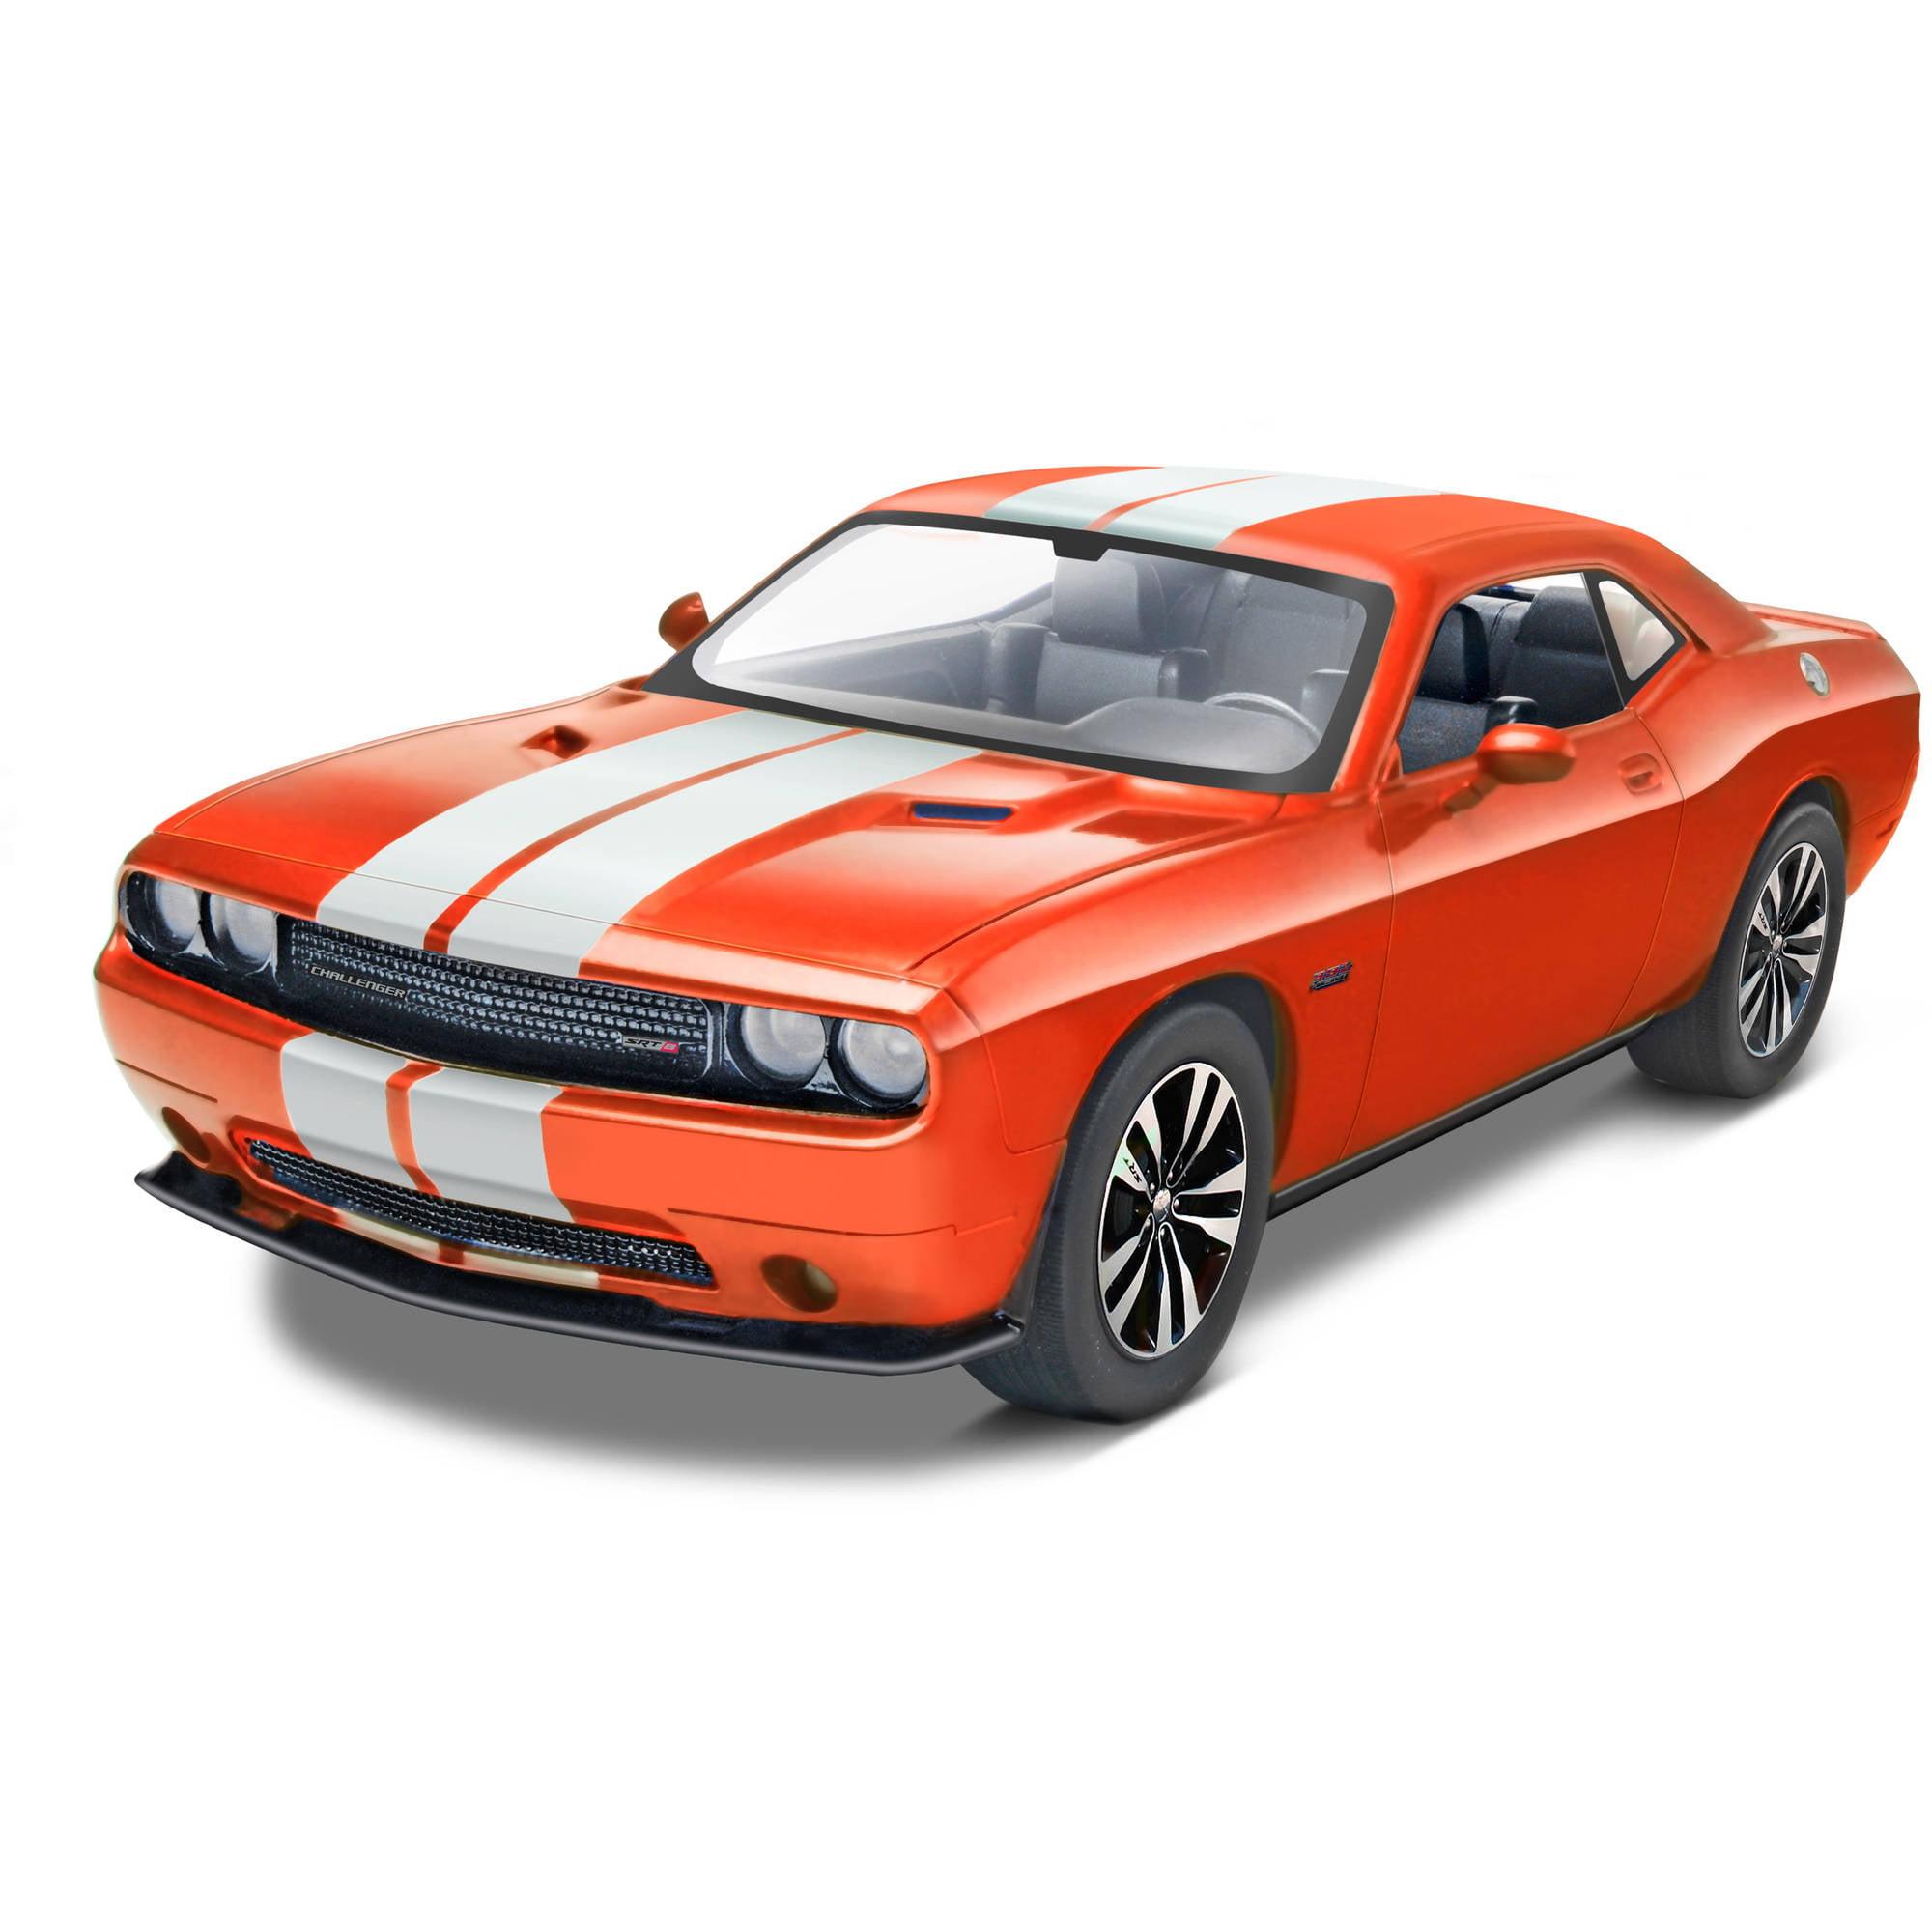 85-4358 Revell Pre-Decorated Orange 2013 Challenger SRT8 Model Kit by Generic